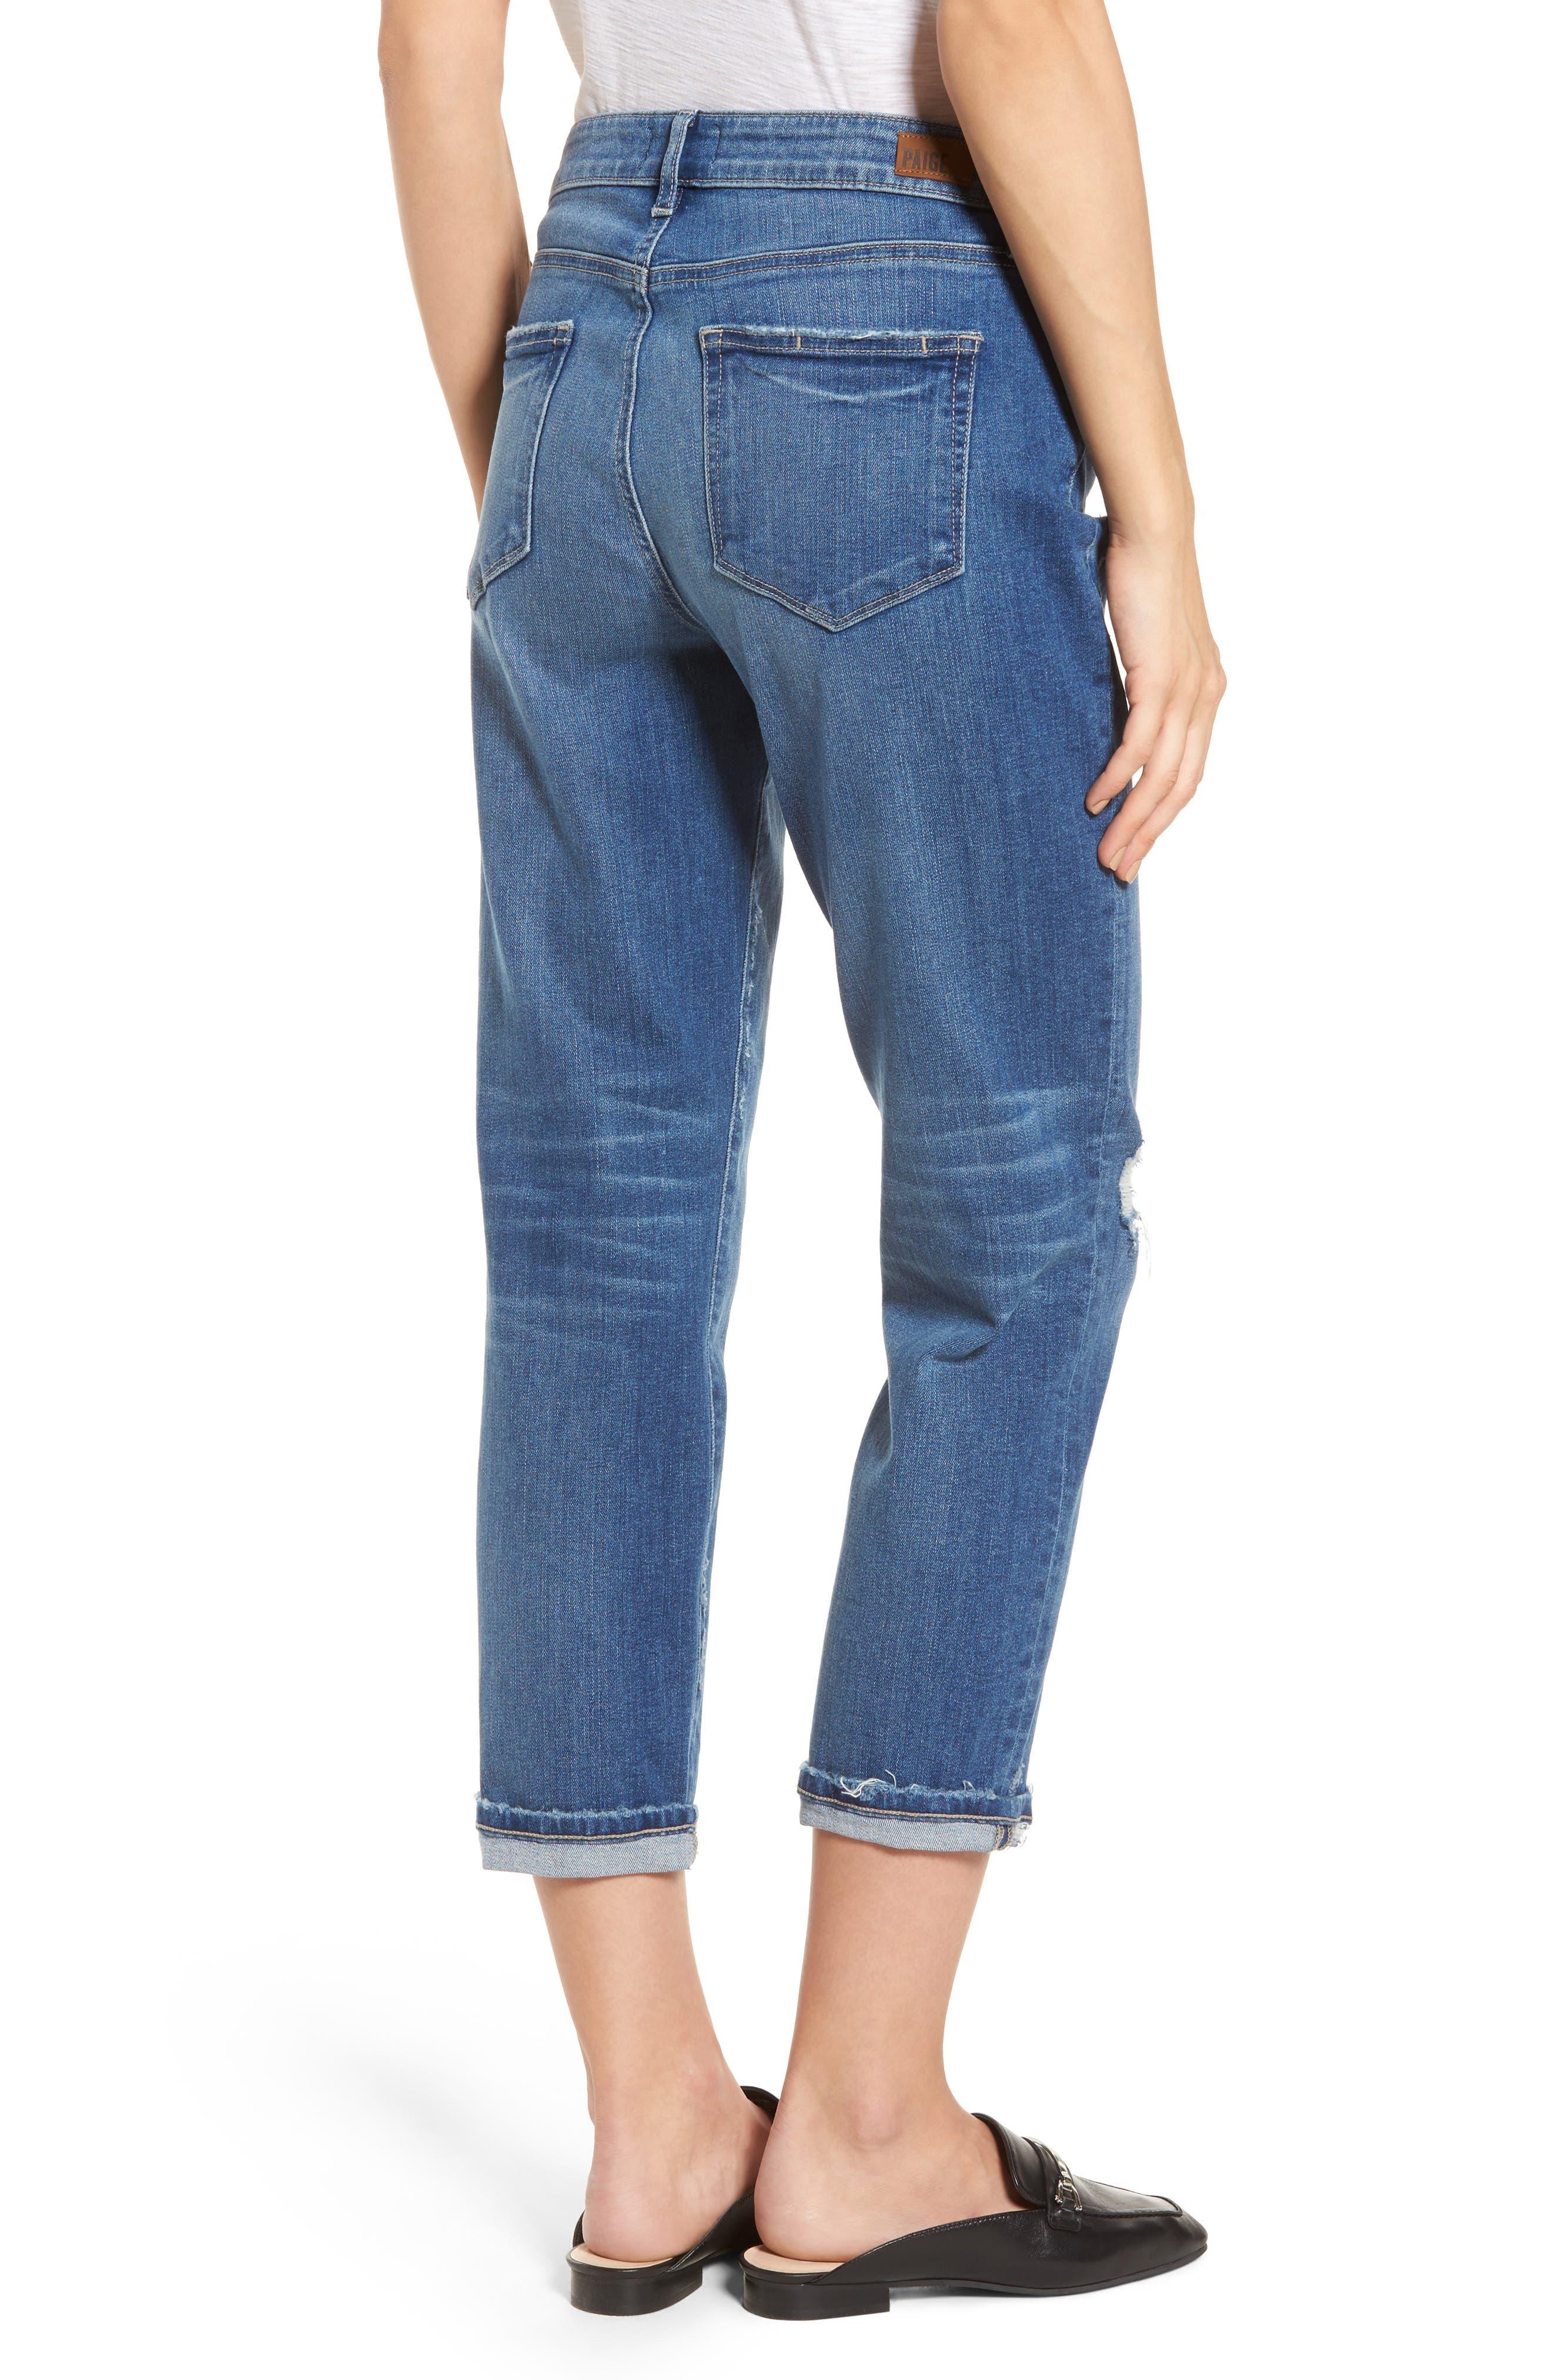 Jimmy Jimmy High Waist Crop Boyfriend Jeans,                             Alternate thumbnail 2, color,                             Ludlow Destructed